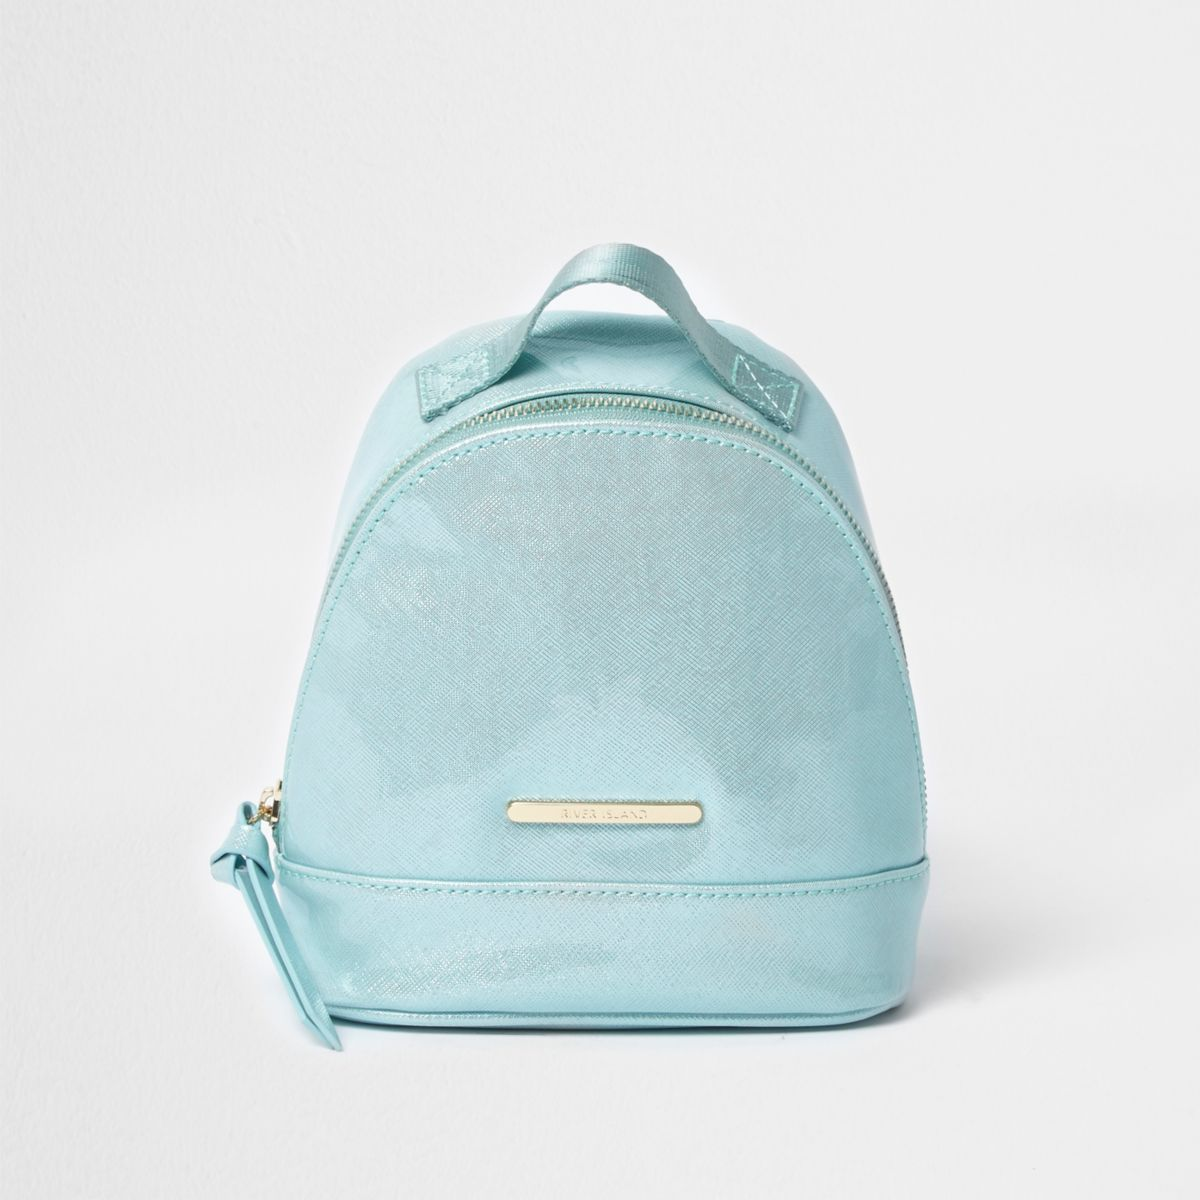 Girls teal blue patent mini backpack